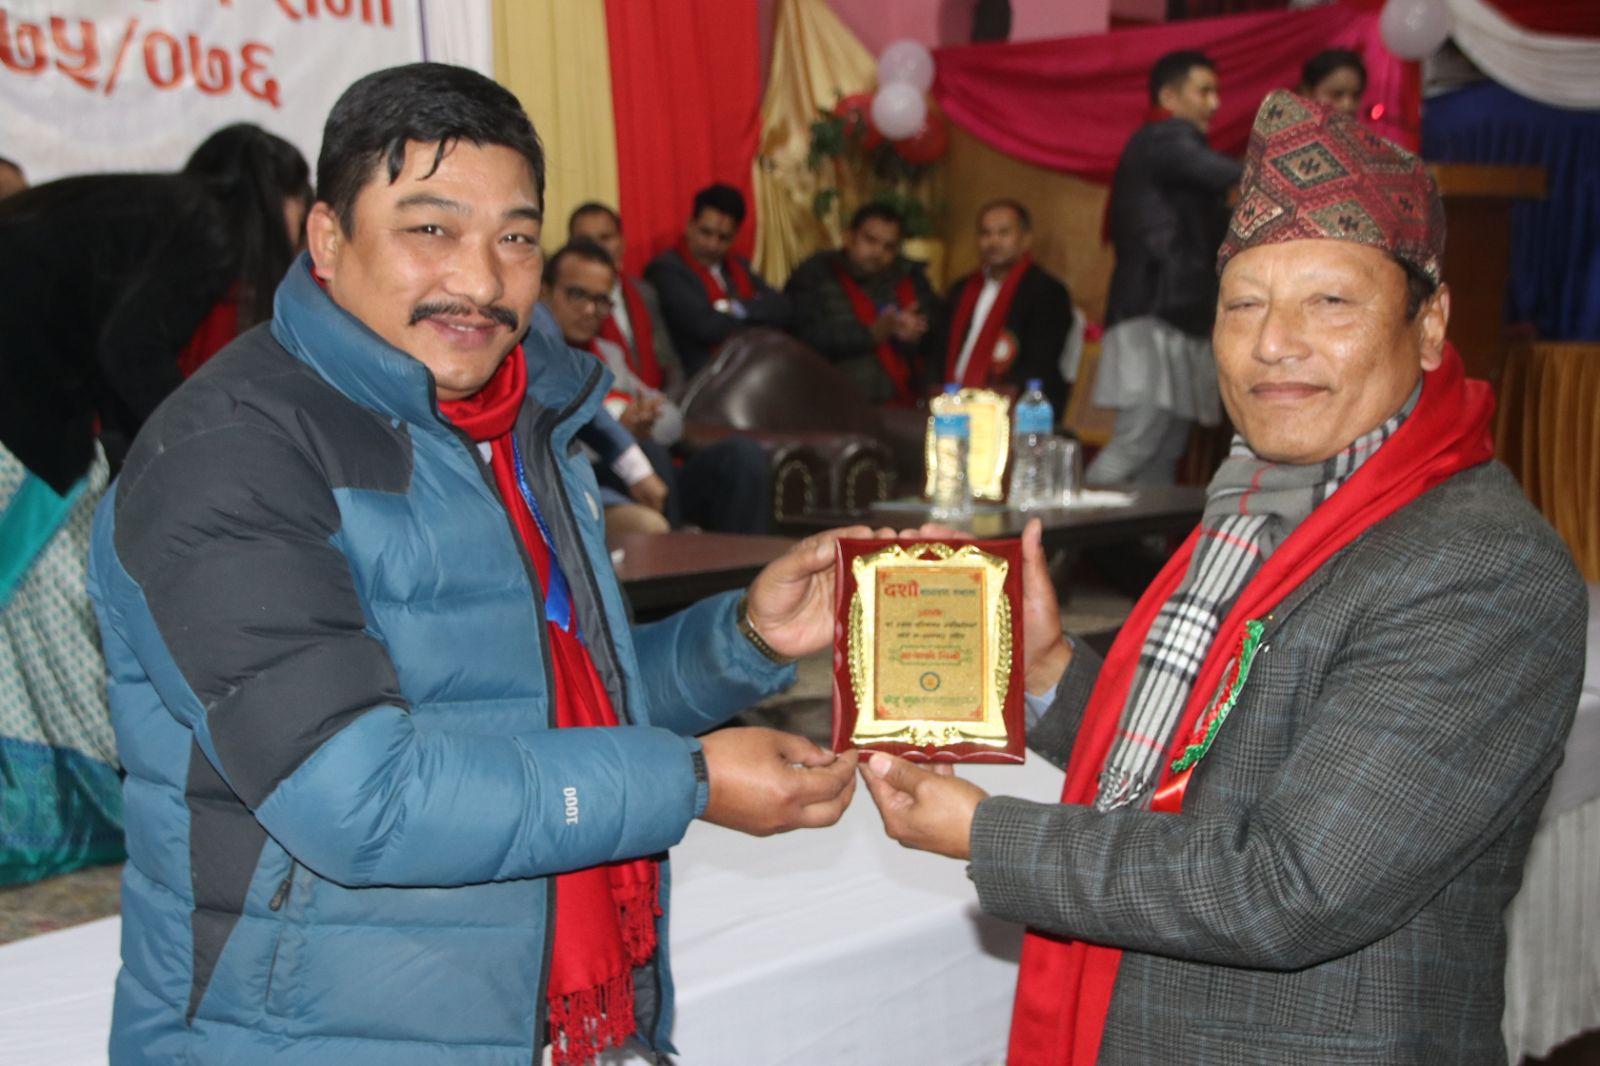 Suraj Shrestha CEO Navabishal MPCL